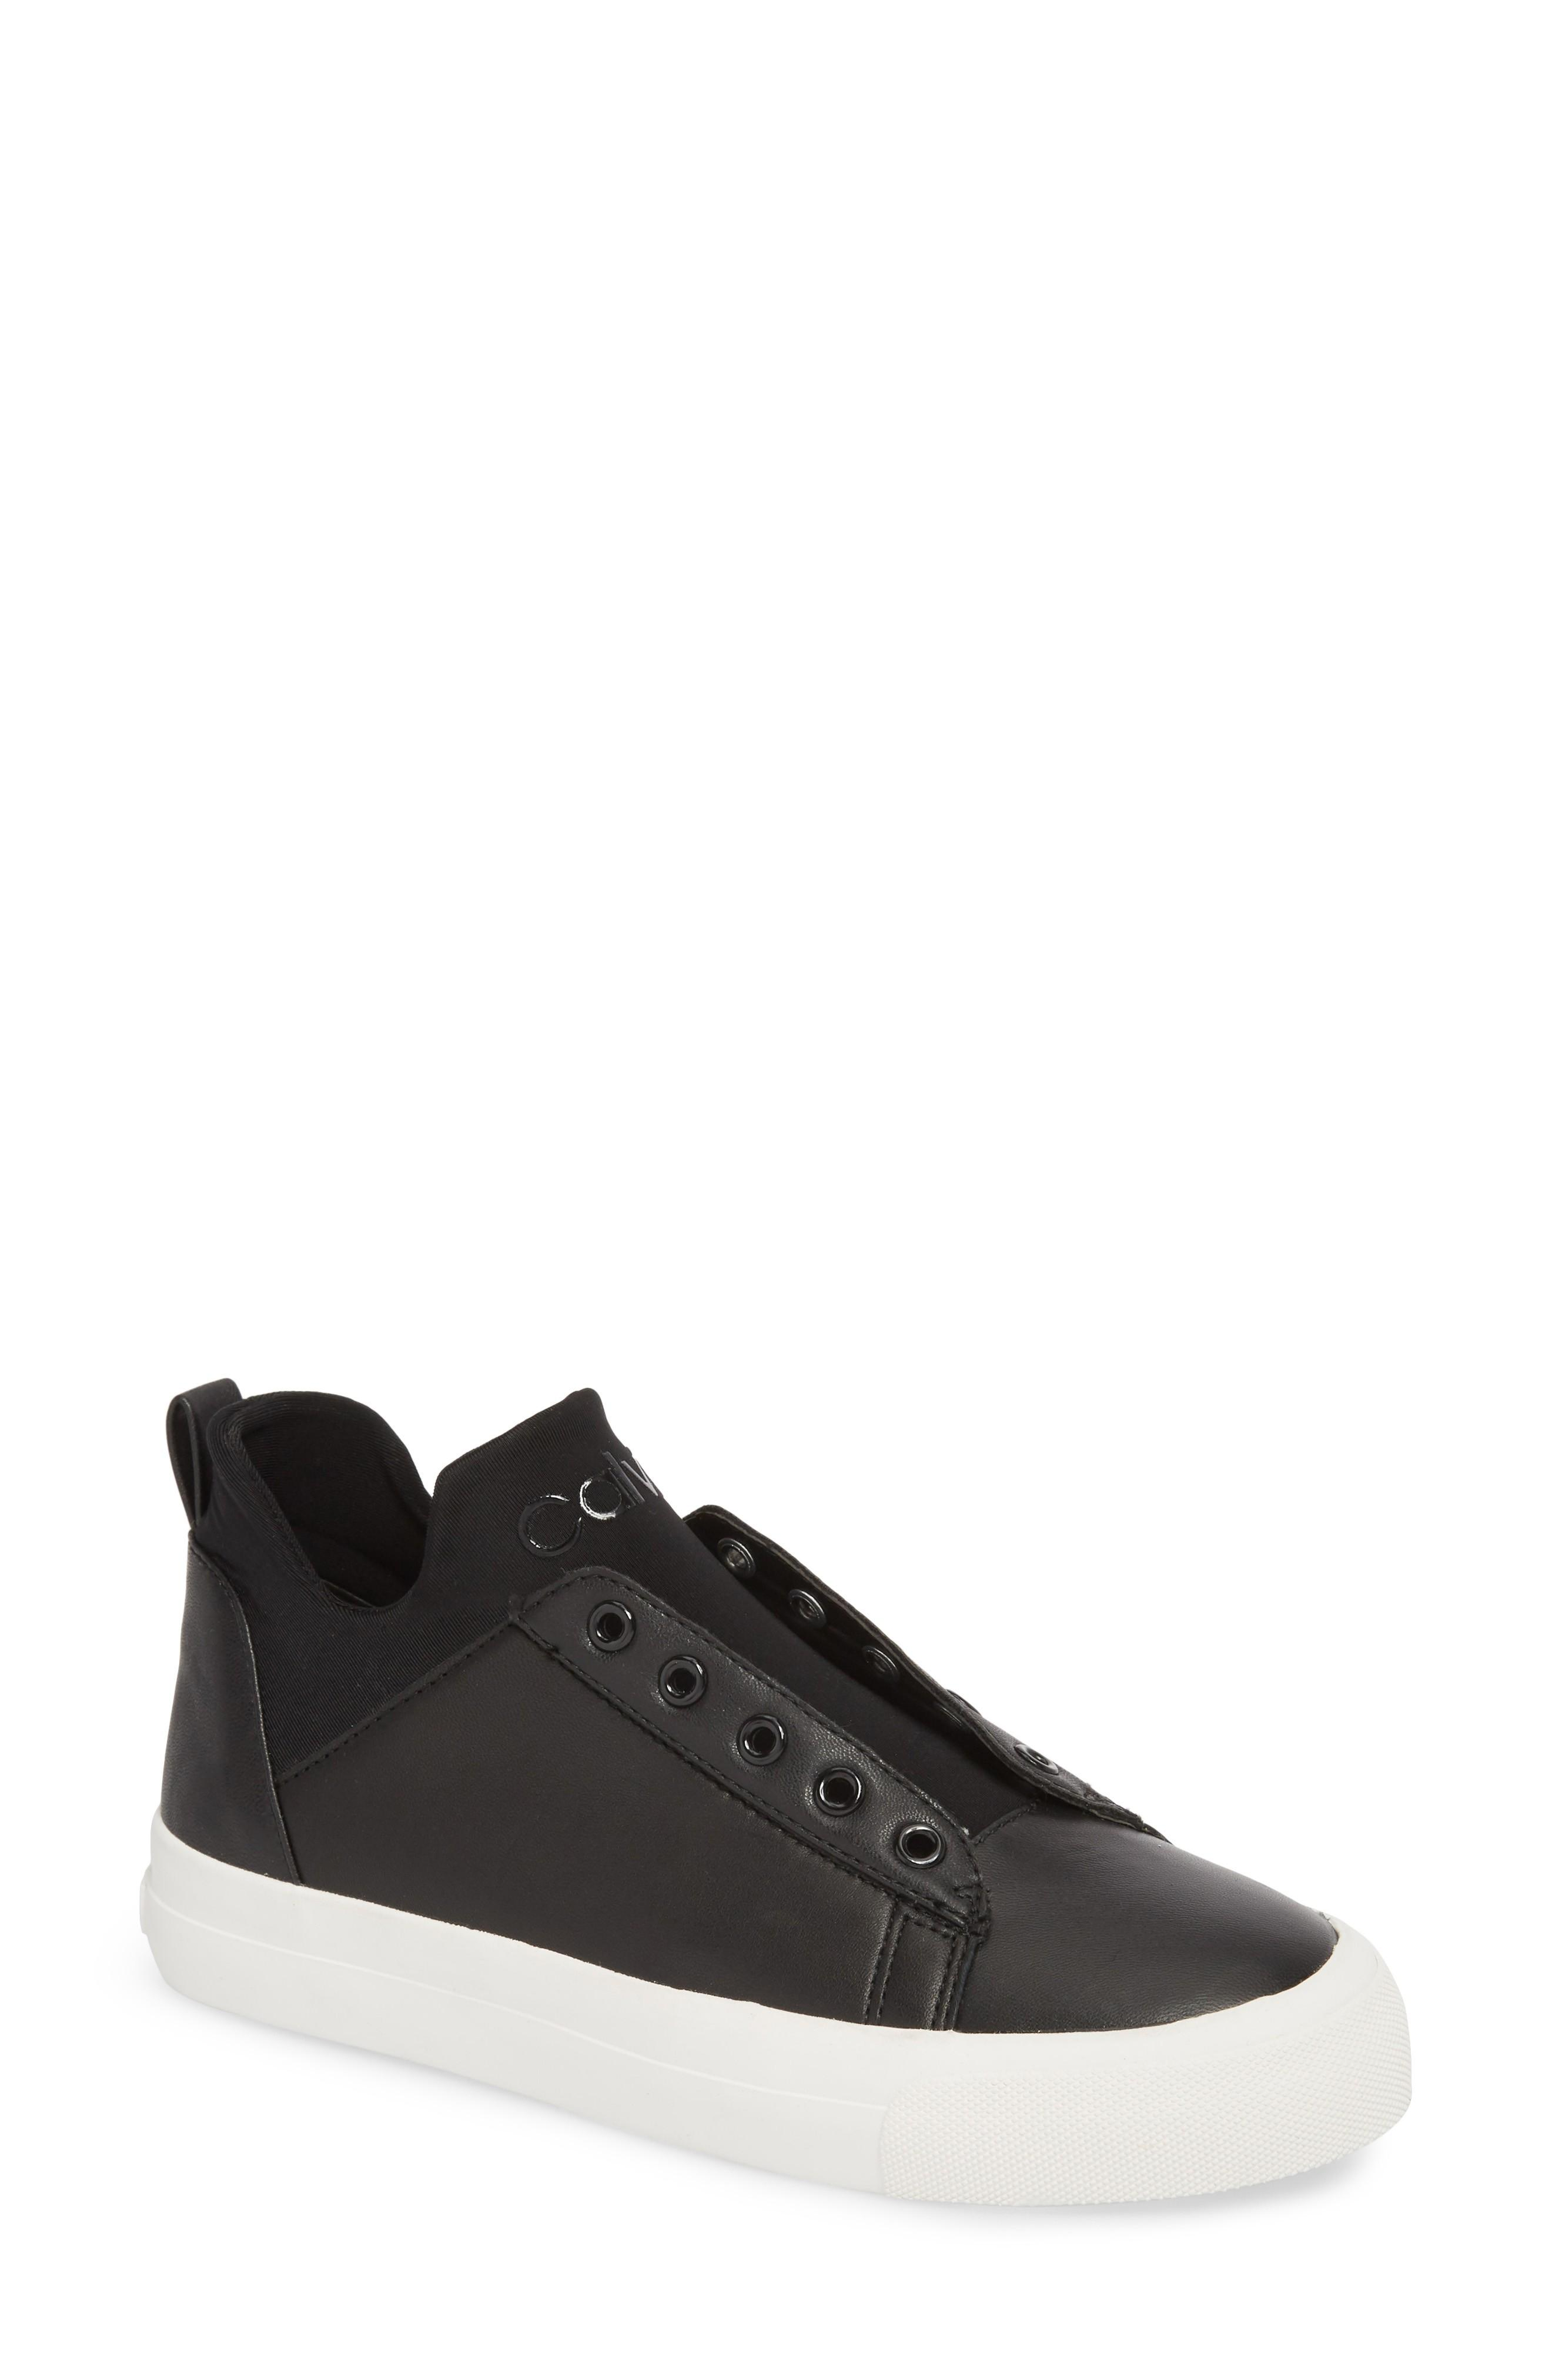 82de51b2278a49 Calvin Klein Valorie Mid Top Sneaker In Black Leather | ModeSens